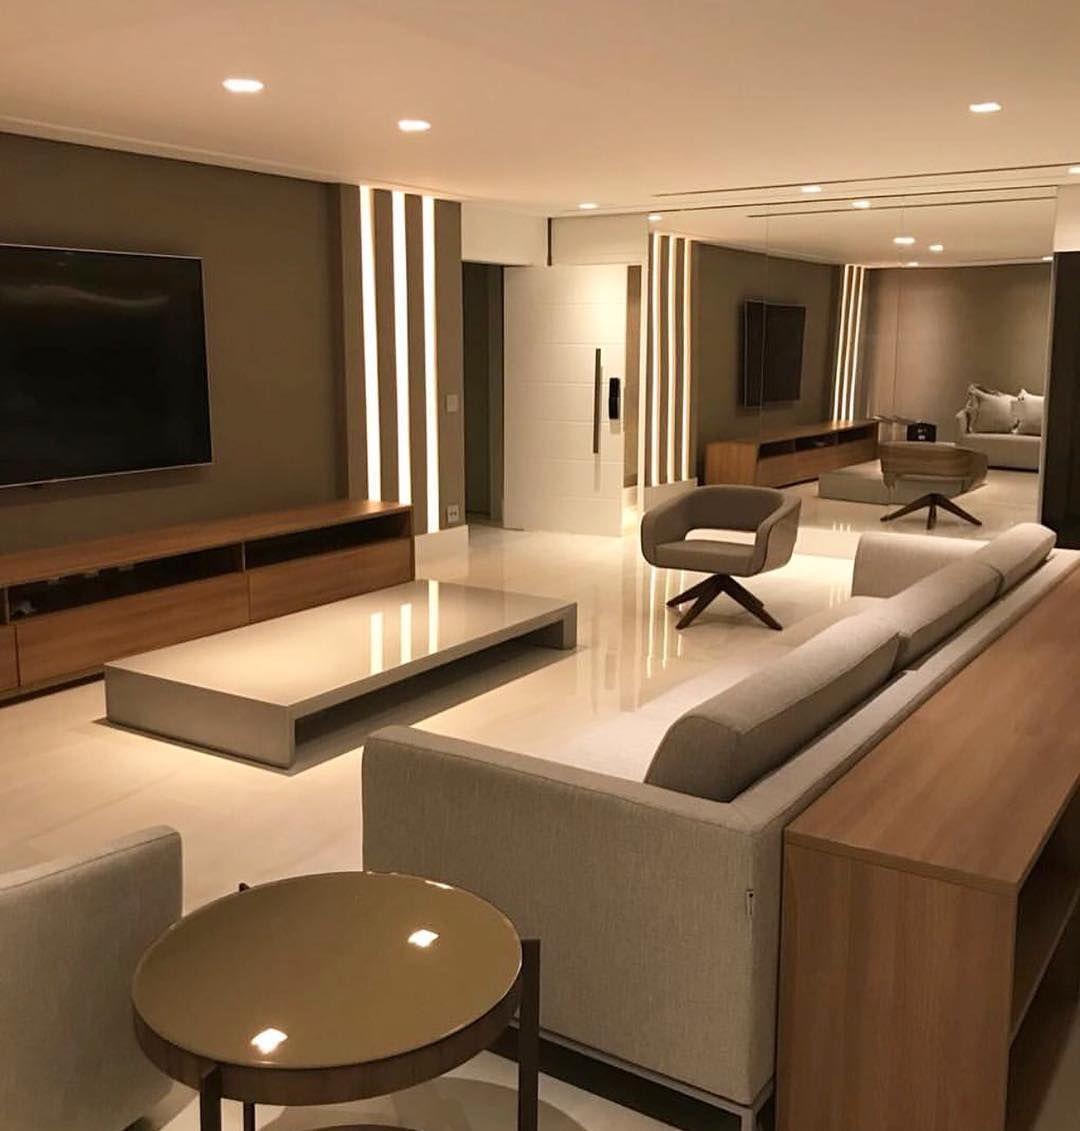 18 Ambrosial Dining Furniture Dream Homes Ideas Ceiling De